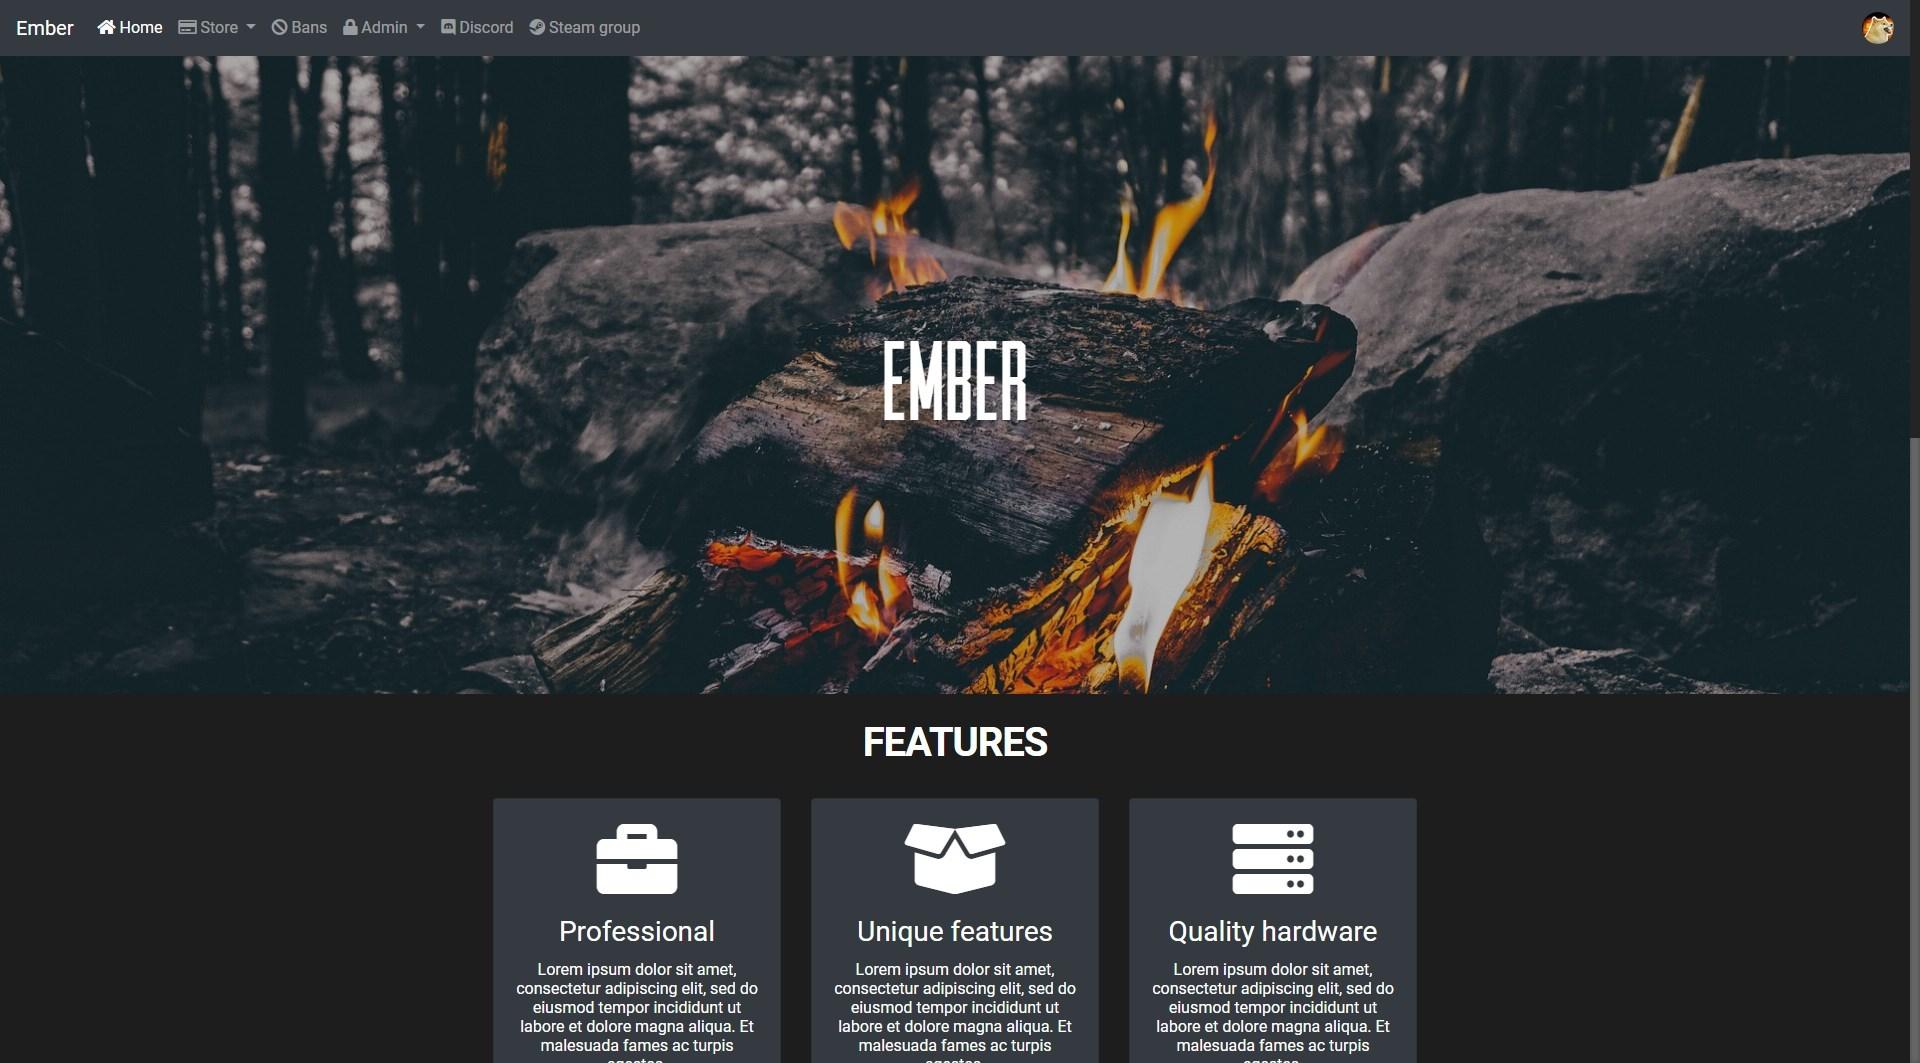 Ember - donation system, bans, loading screen & landing